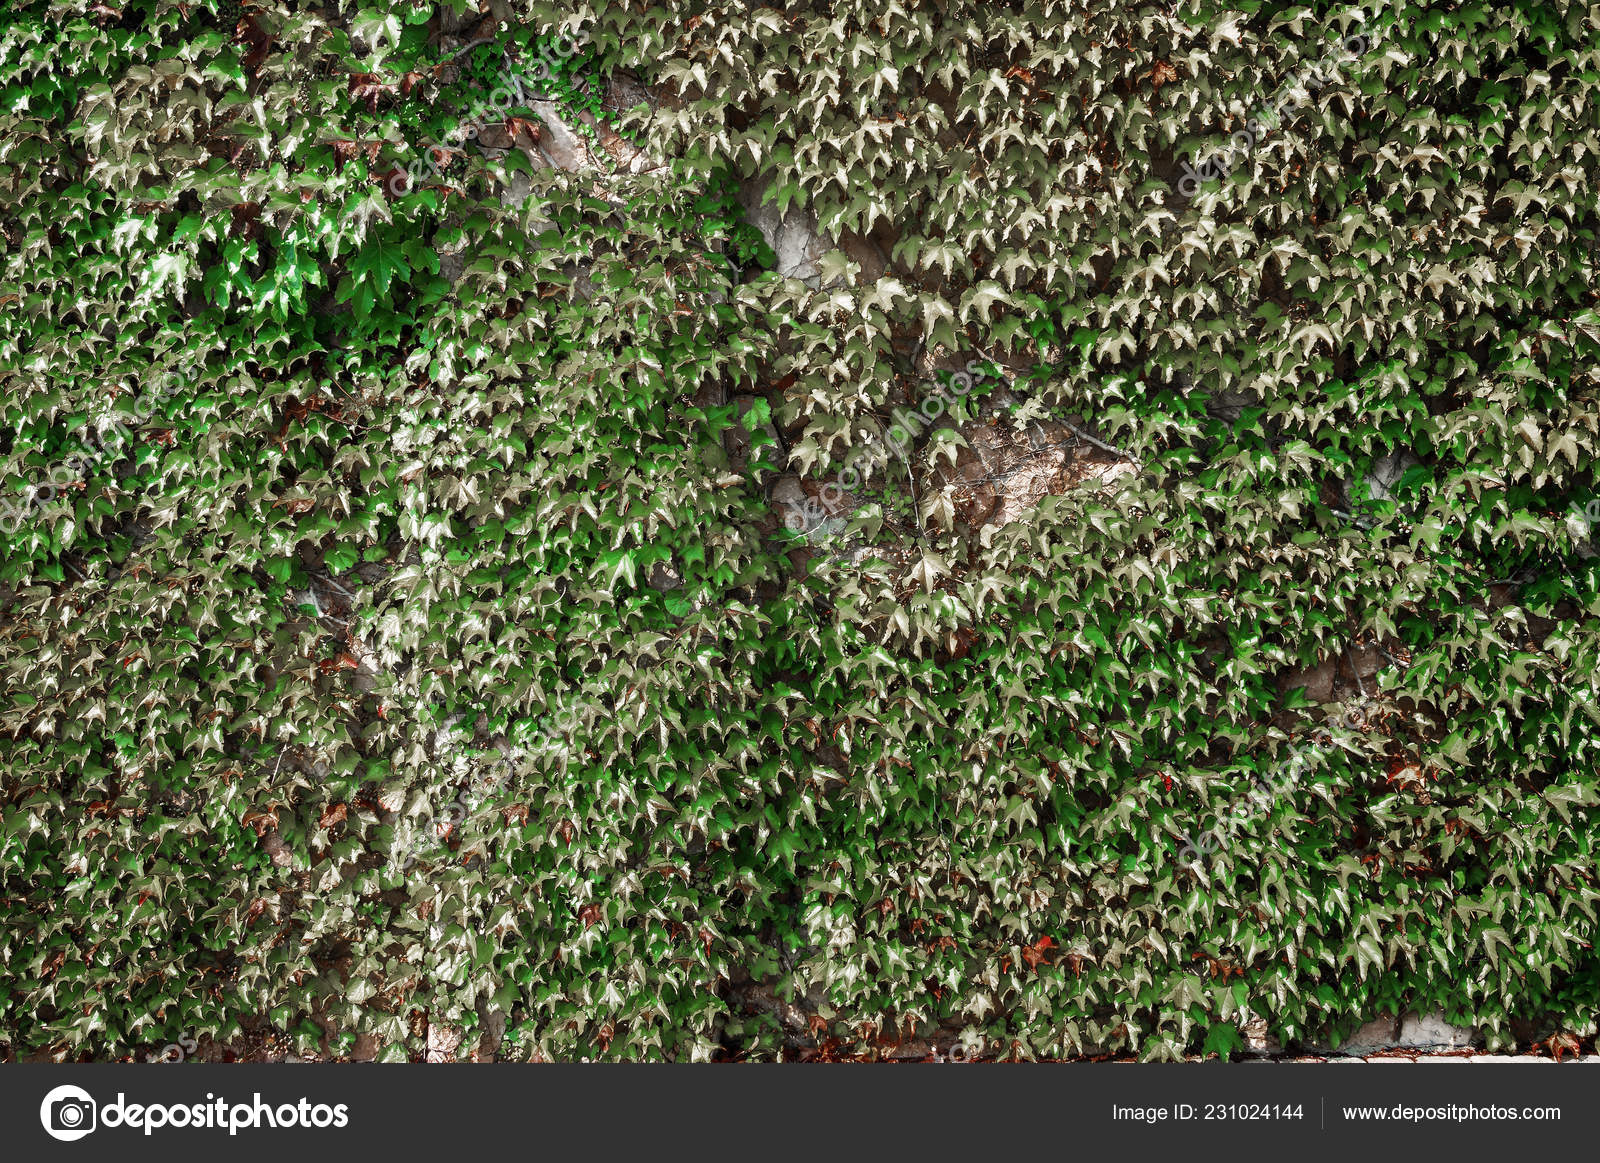 Fence Green Space Stone Climbing Plants Stock Photo C Chingis61